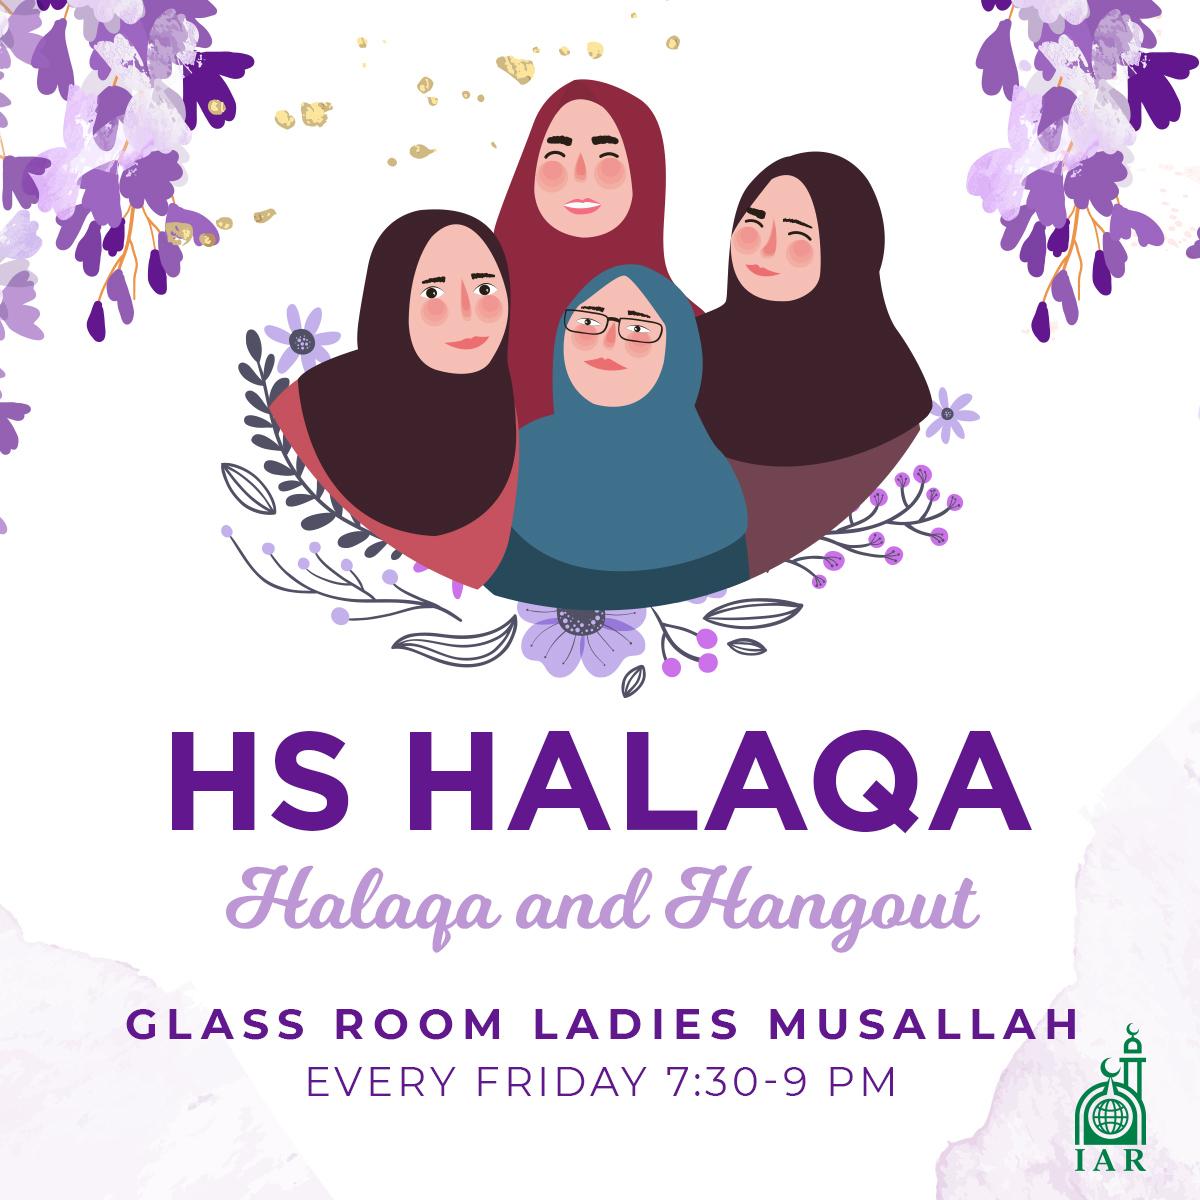 HS Girls Hangout & Halaqa